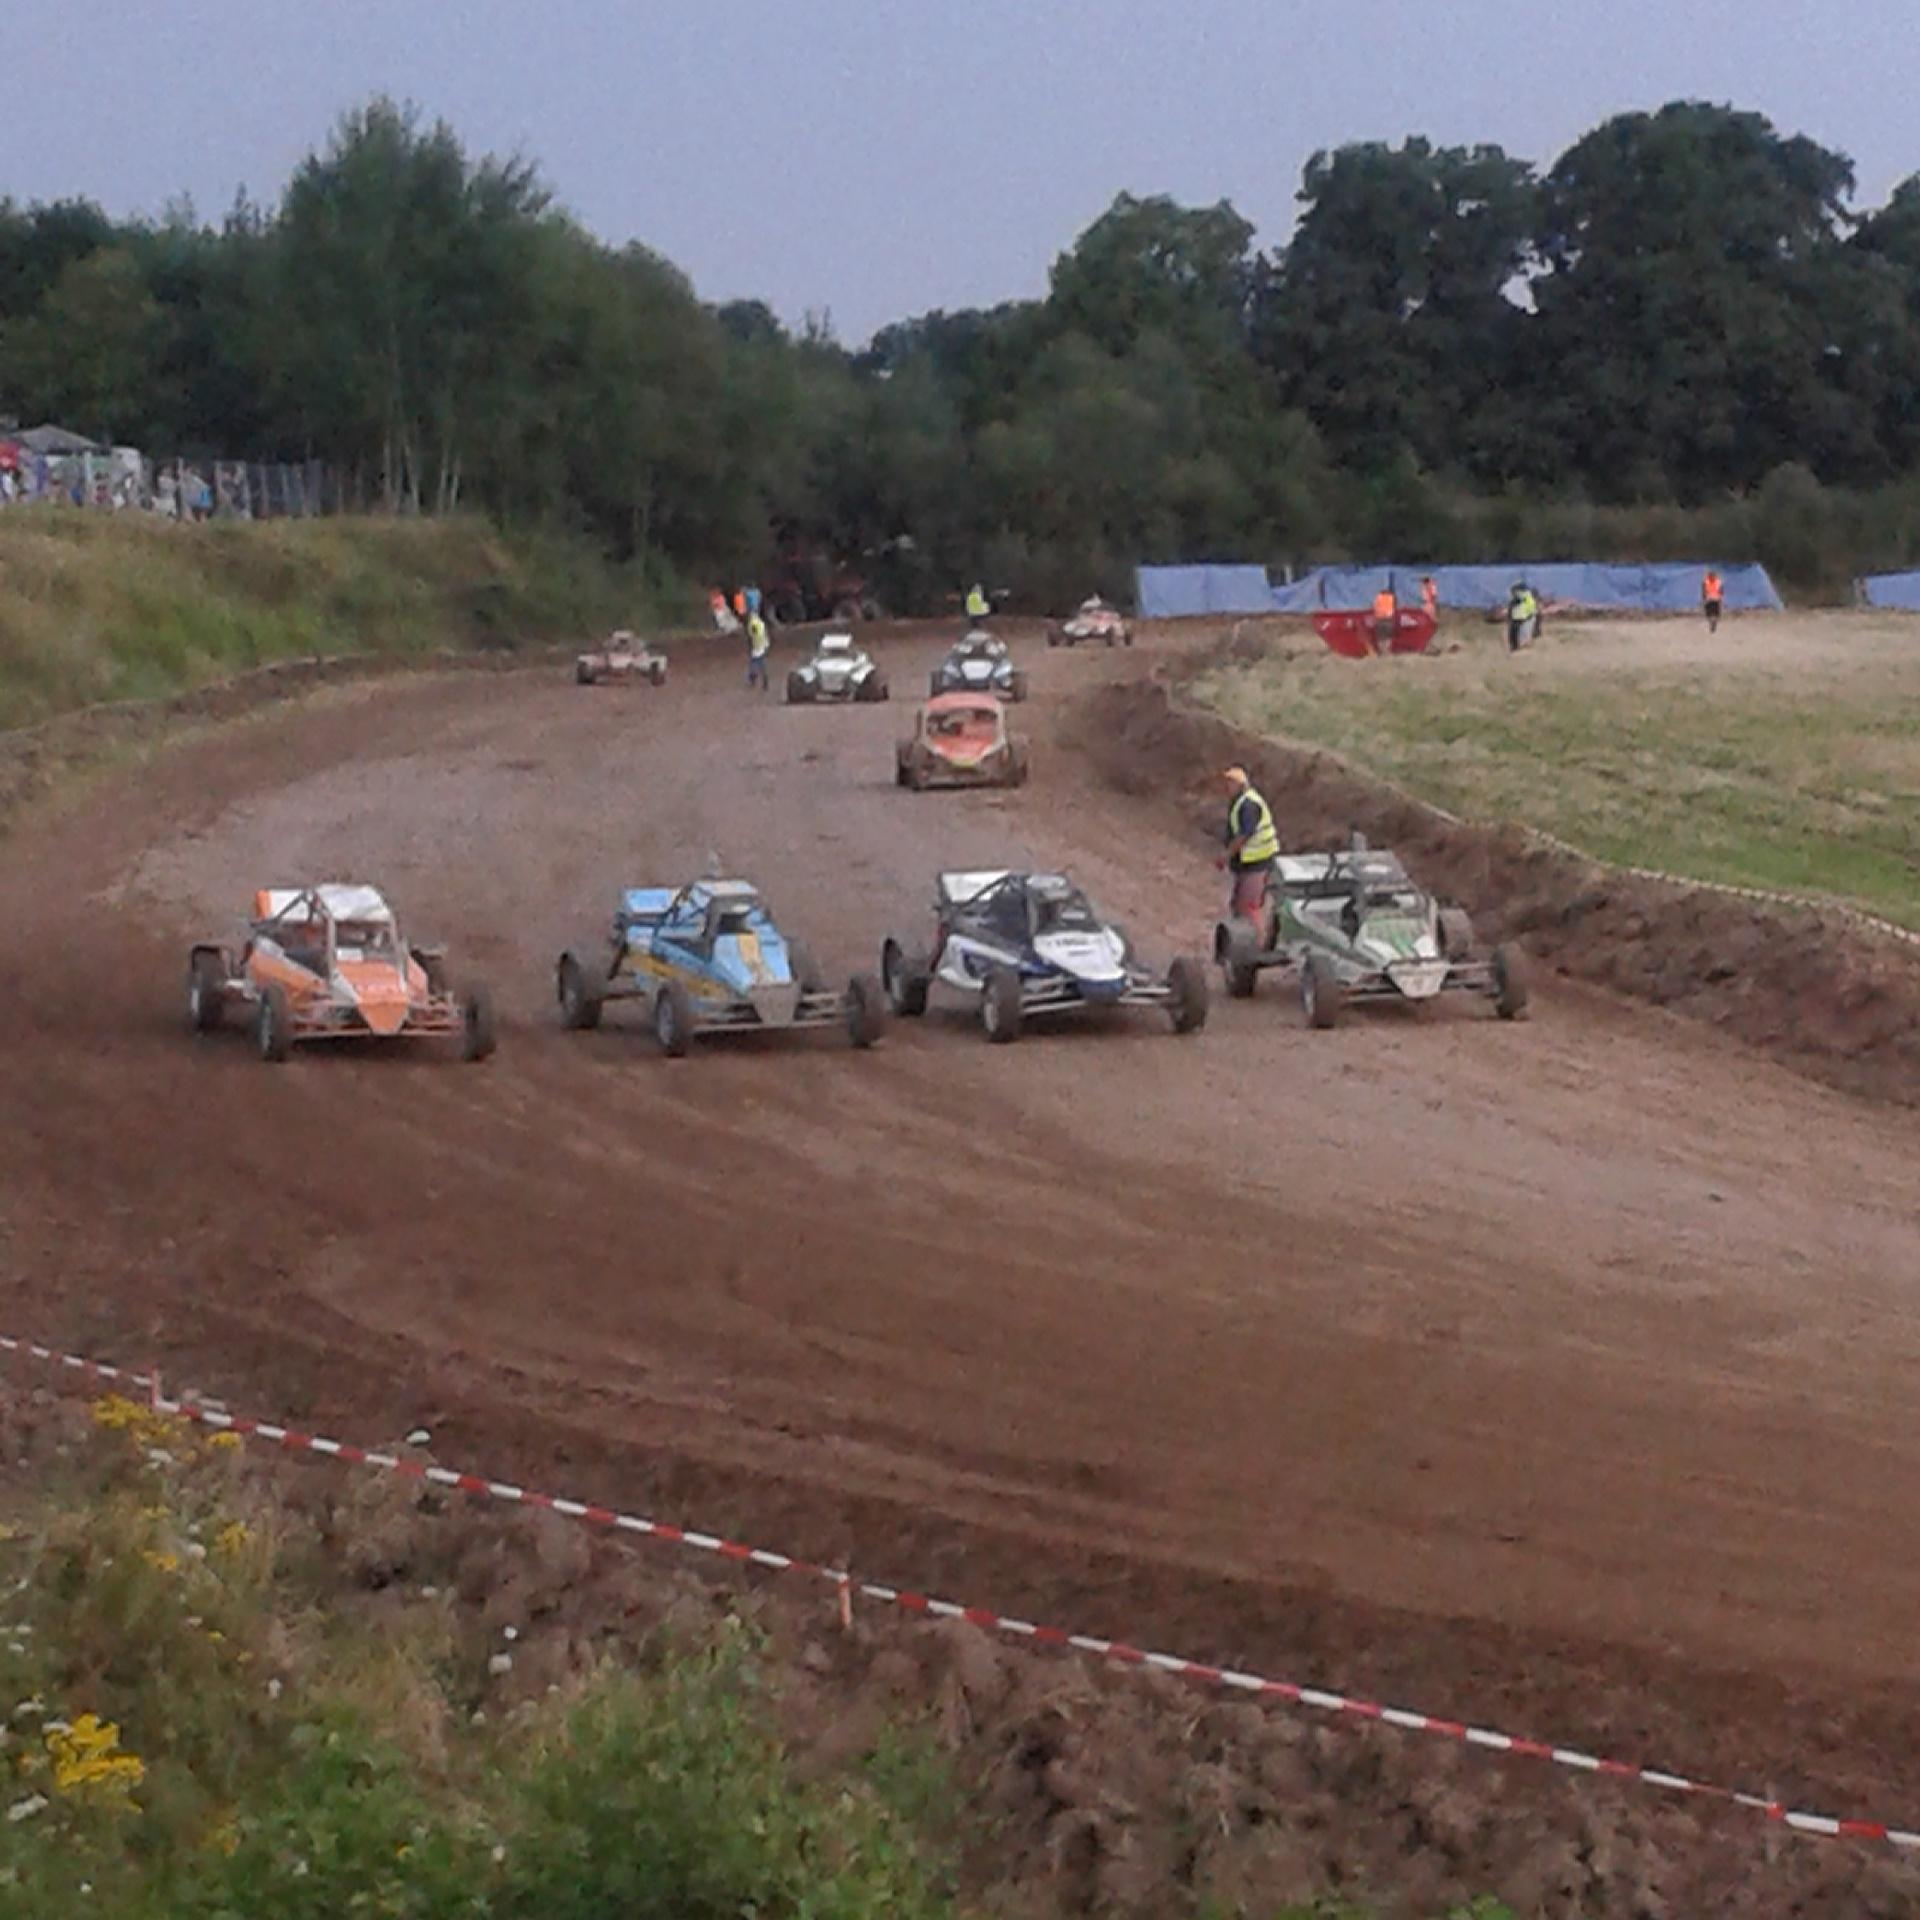 Autocross Ledde 2014